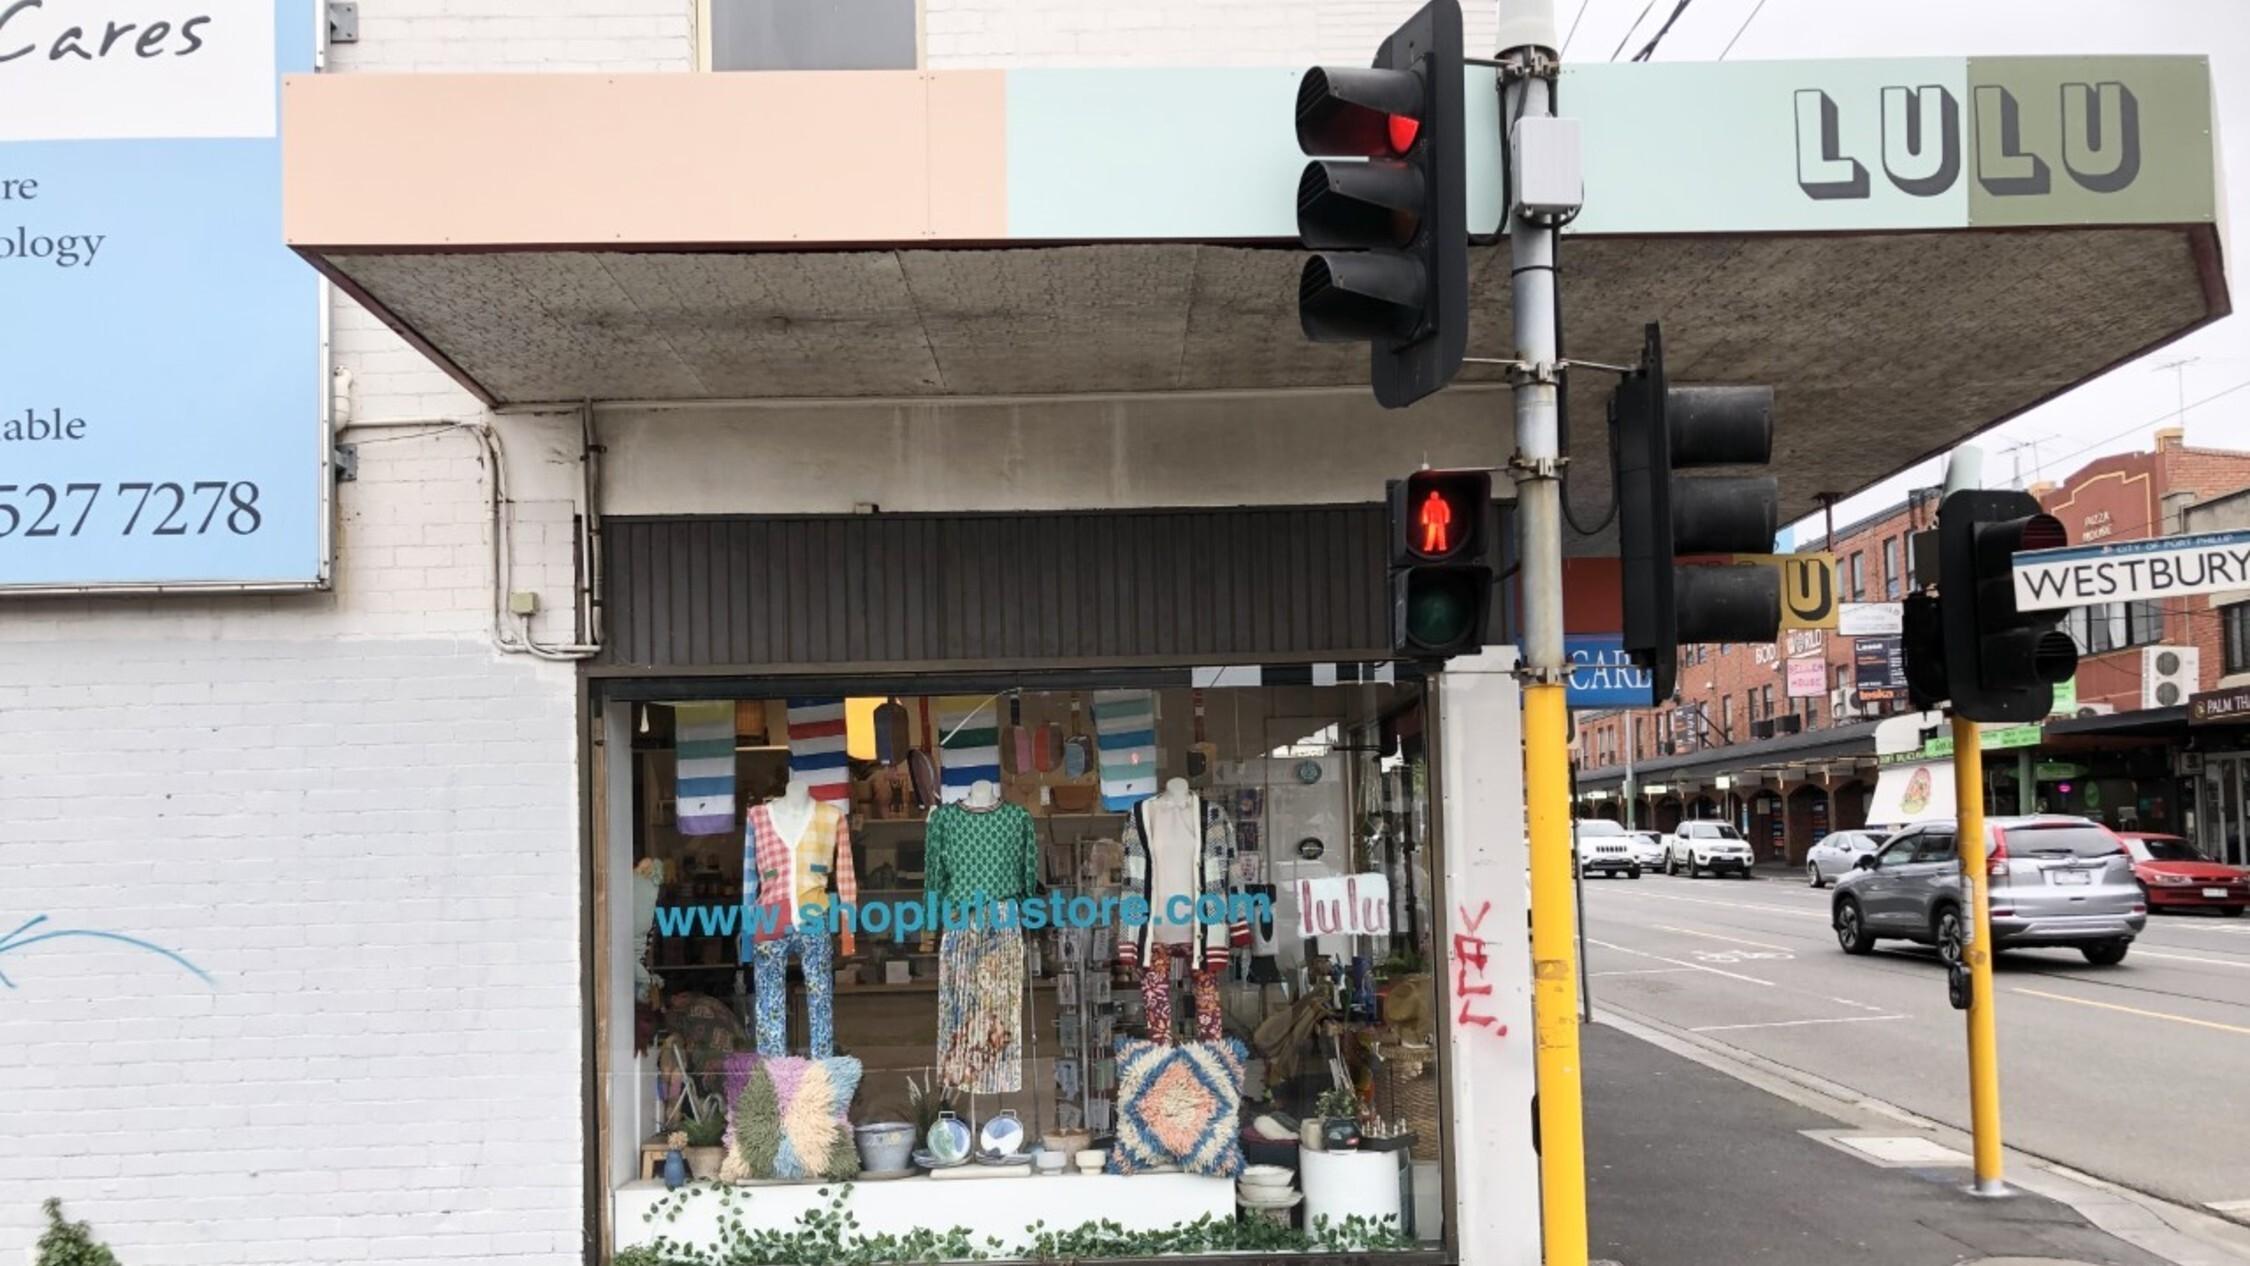 Lulu Balaclava shopfront